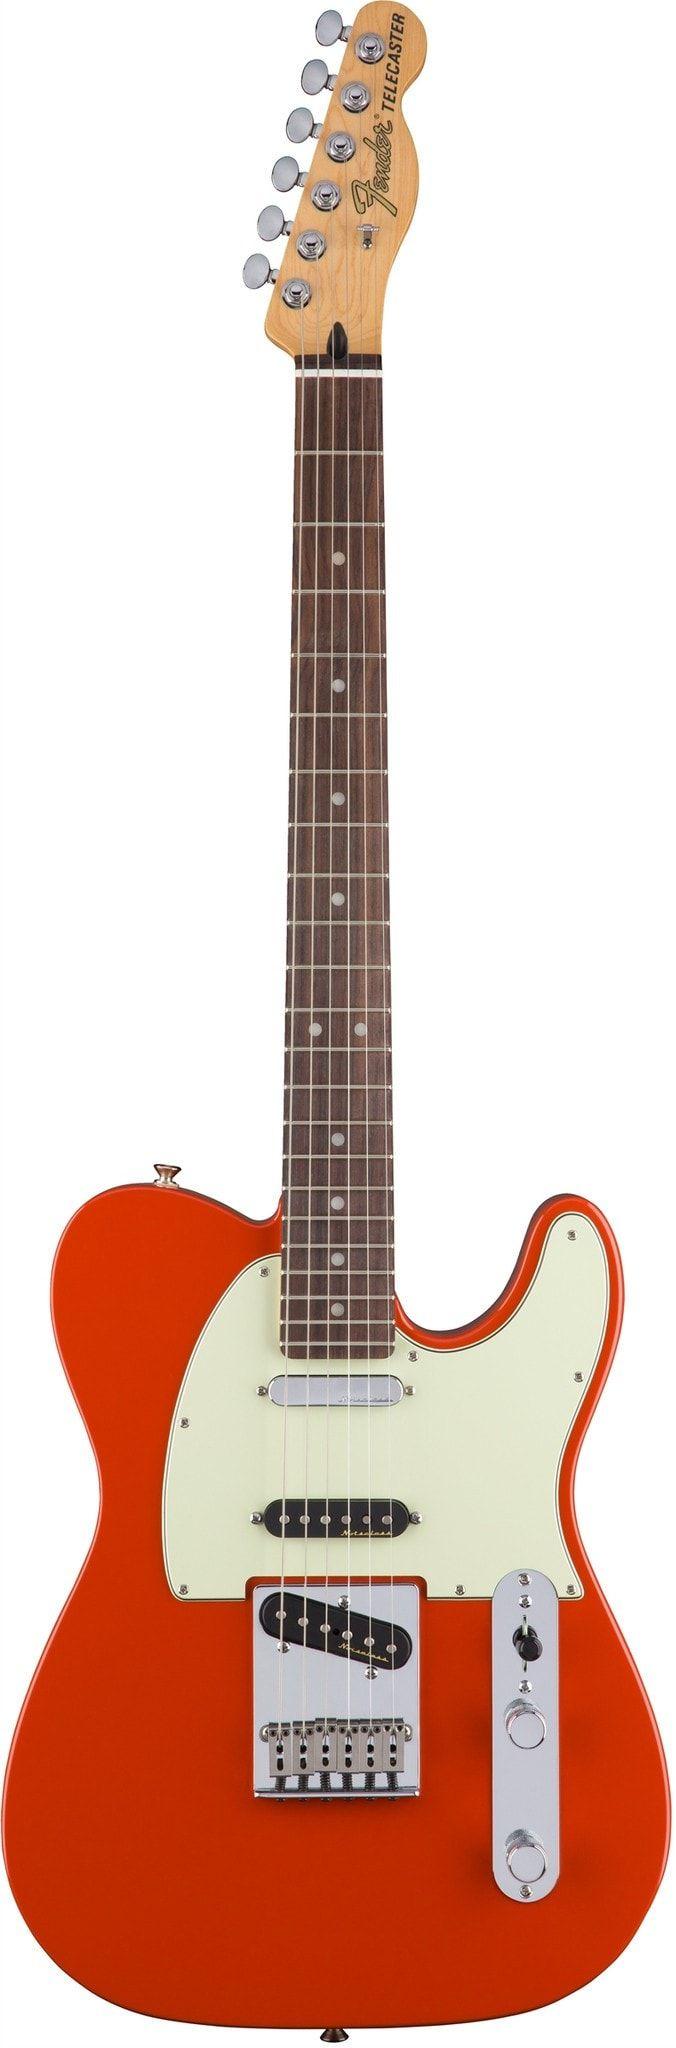 Fender Deluxe Nashville Telecaster Electric Guitar Electric Guitar Fender Deluxe Telecaster